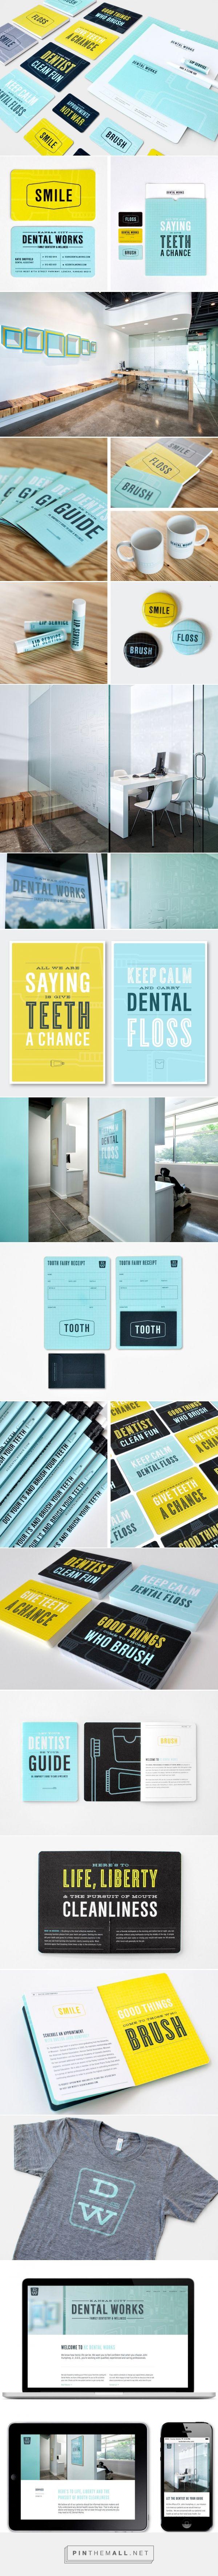 KC Dental Works » Design Ranch Design Ranch - created via https://pinthemall.net